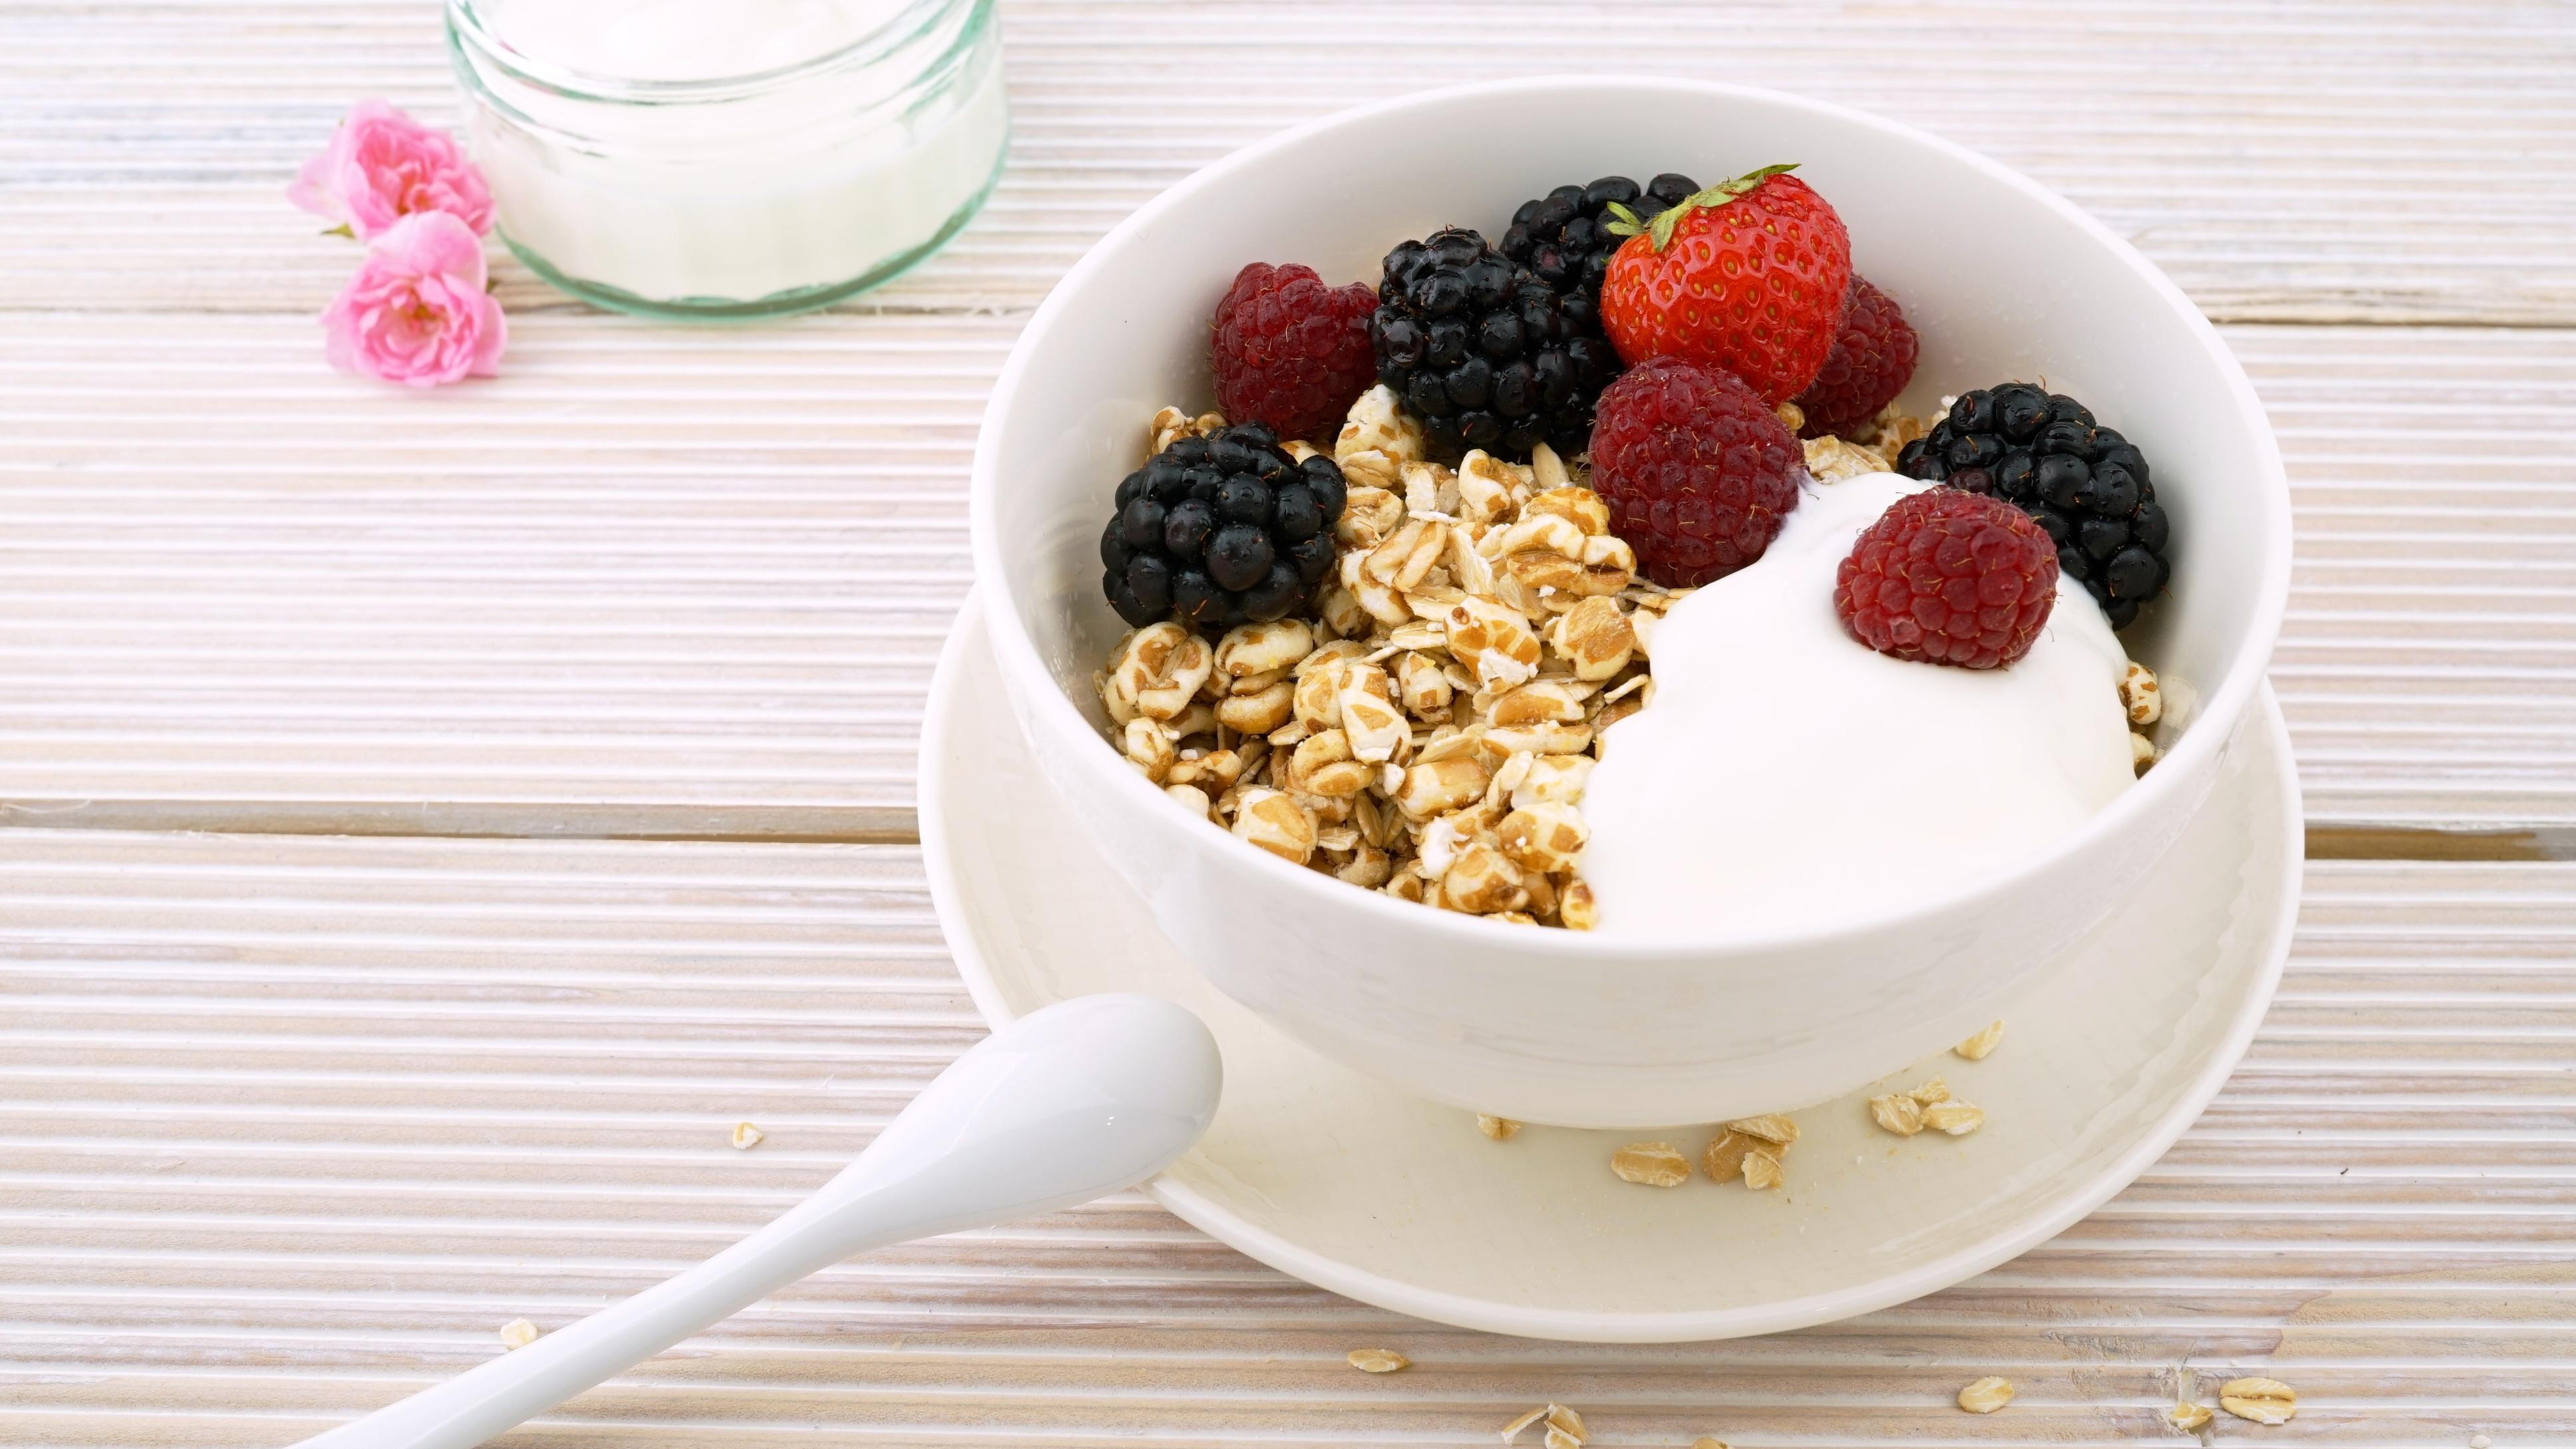 manfaat makan oatmeal